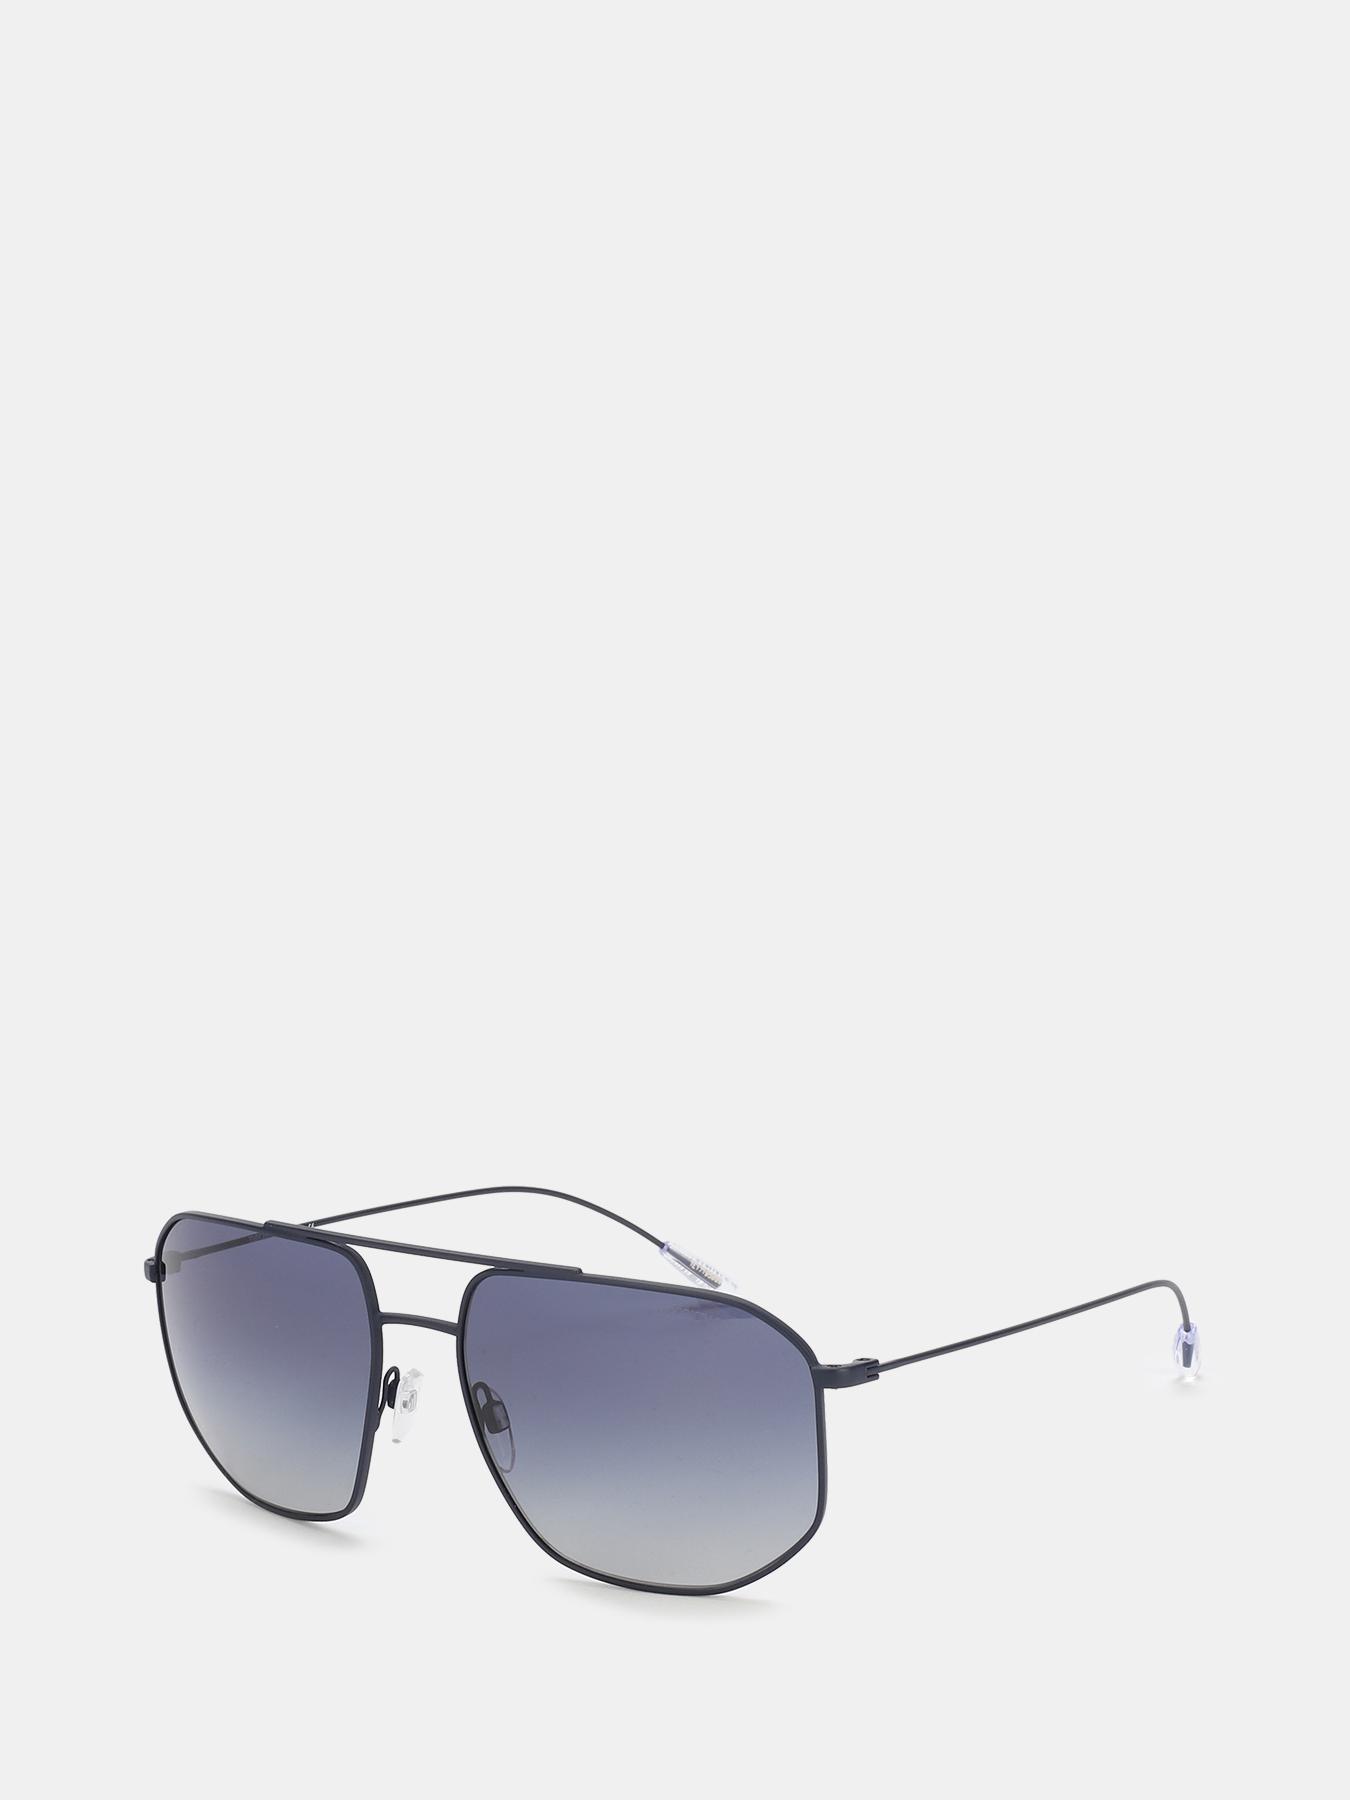 Очки Emporio Armani Солнцезащитные очки солнцезащитные очки kameo bis солнцезащитные очки